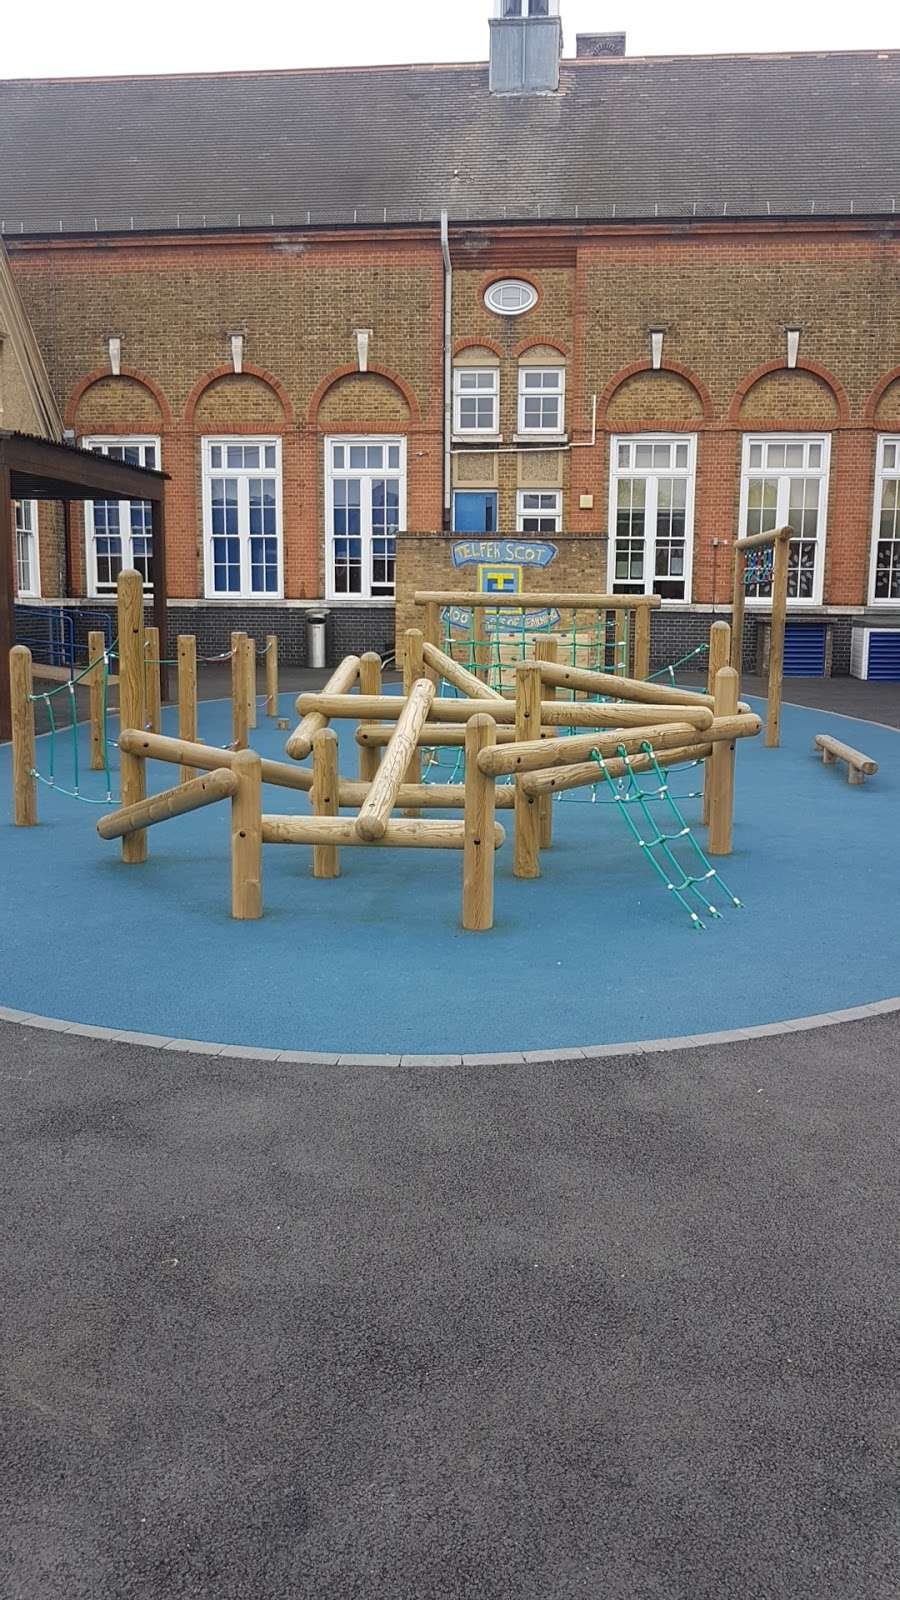 Telferscot Primary School - school  | Photo 2 of 10 | Address: Telferscot Rd, London SW12 0HW, UK | Phone: 020 8673 7362